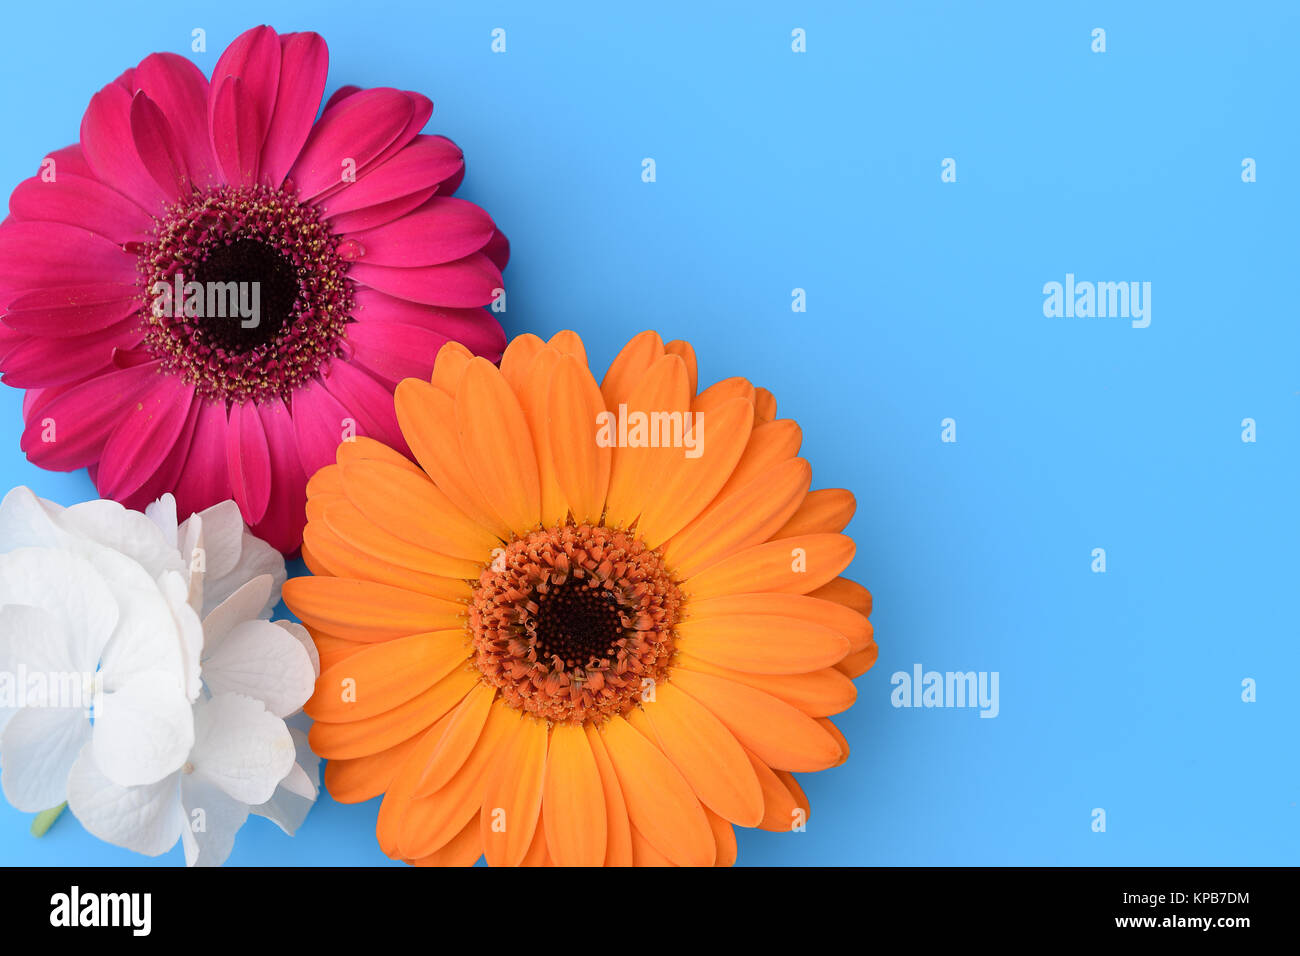 Colorful daisy gerbera flowers and white hortensia flower on stock colorful daisy gerbera flowers and white hortensia flower on turquoise blue background mightylinksfo